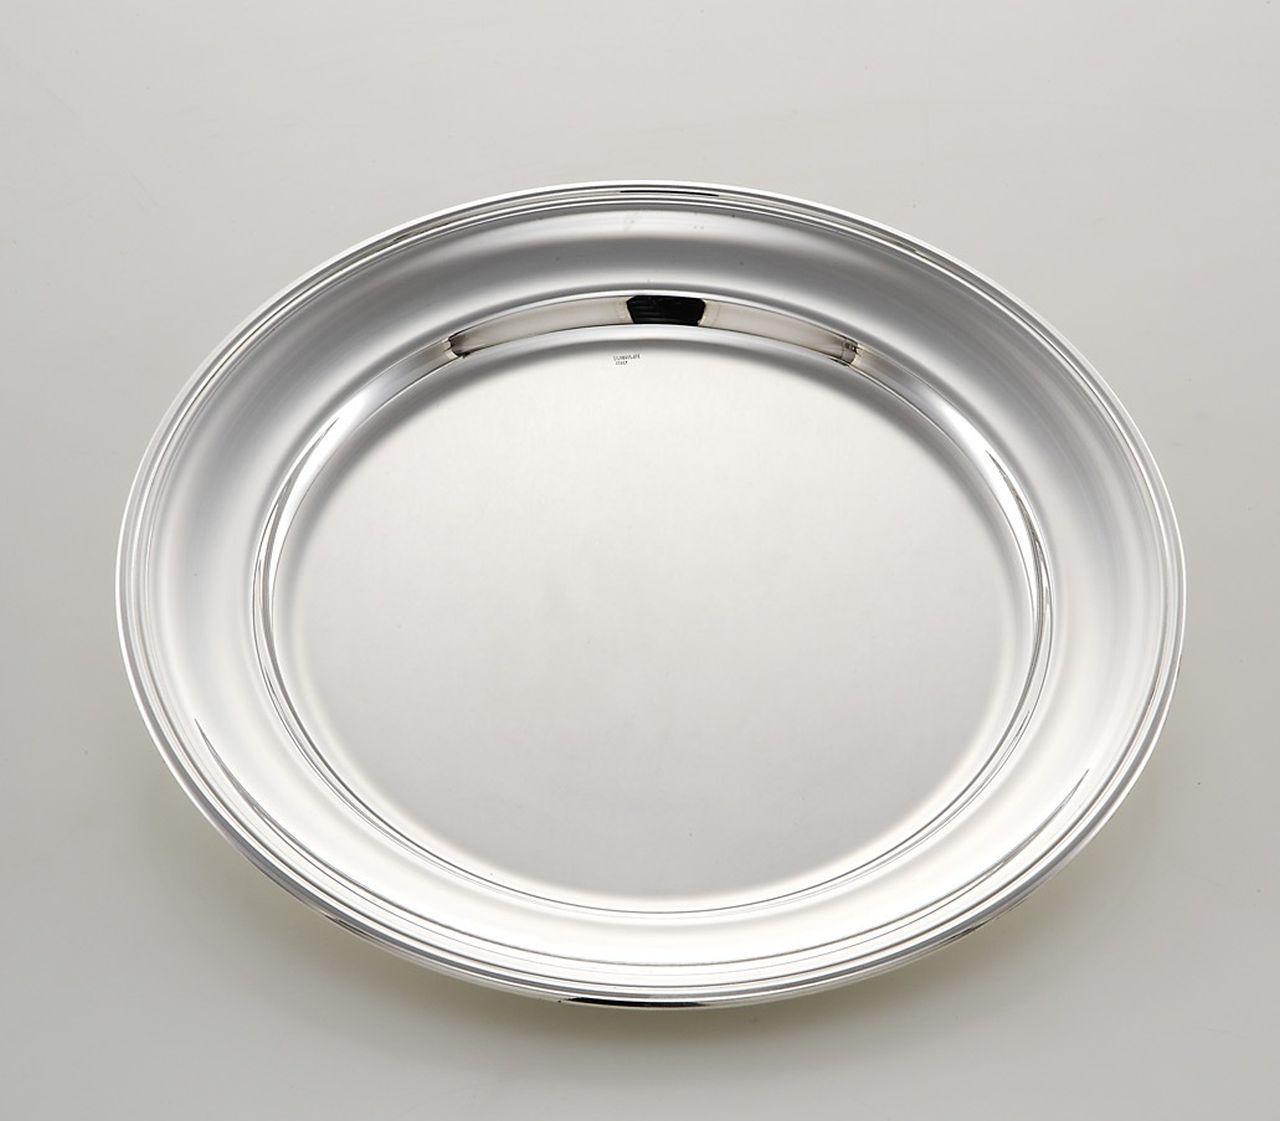 Piatto tondo portata stile Inglese argentato argento sheffield cm.diam.33